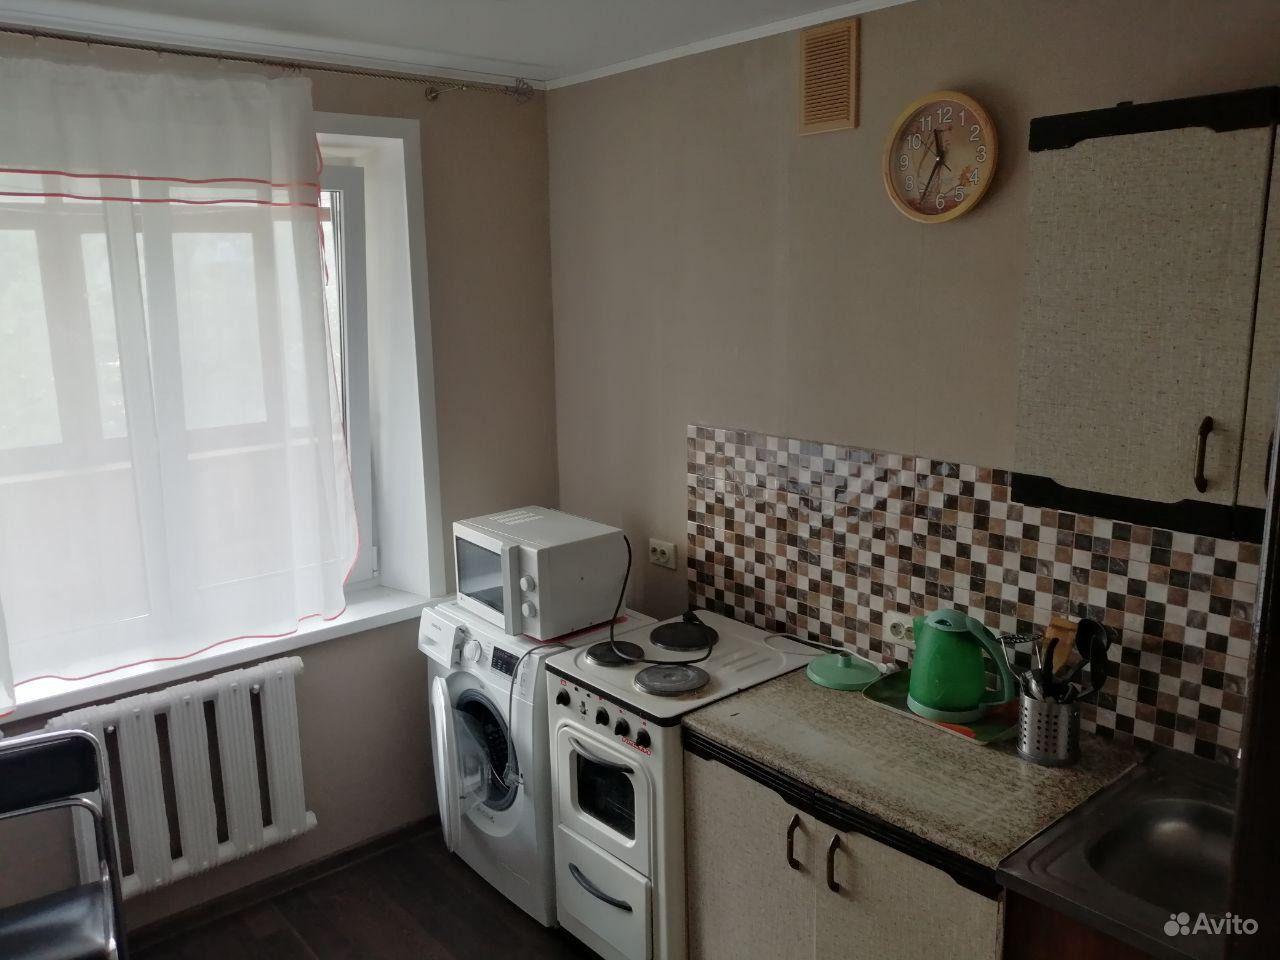 Аренда 1-комнатной квартиры, г. Тольятти, 70 лет Октября улица  дом 26